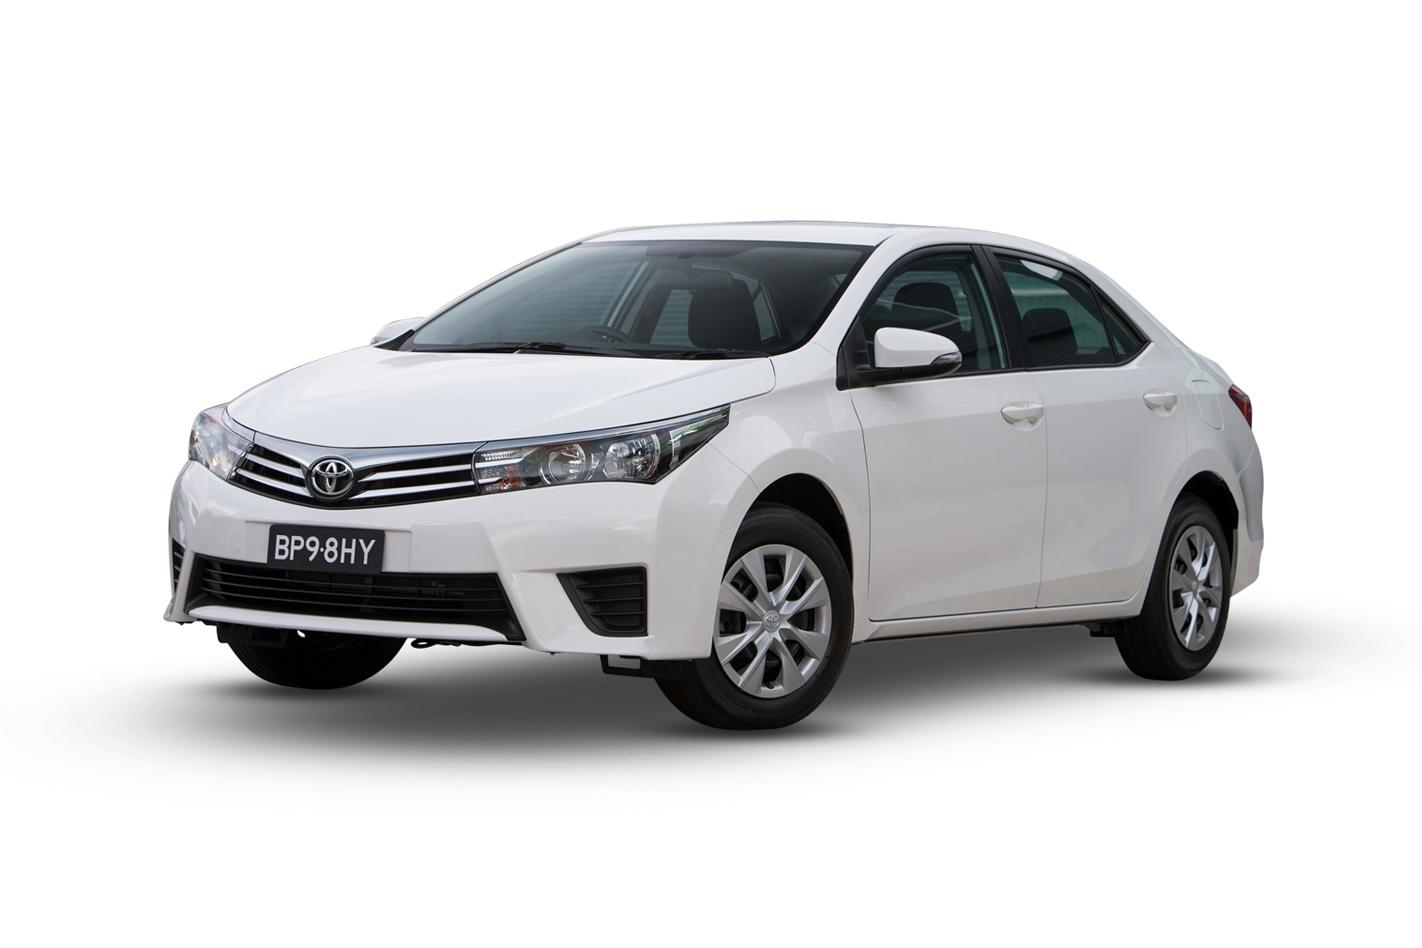 Kekurangan Toyota Corolla 2019 Sedan Top Model Tahun Ini